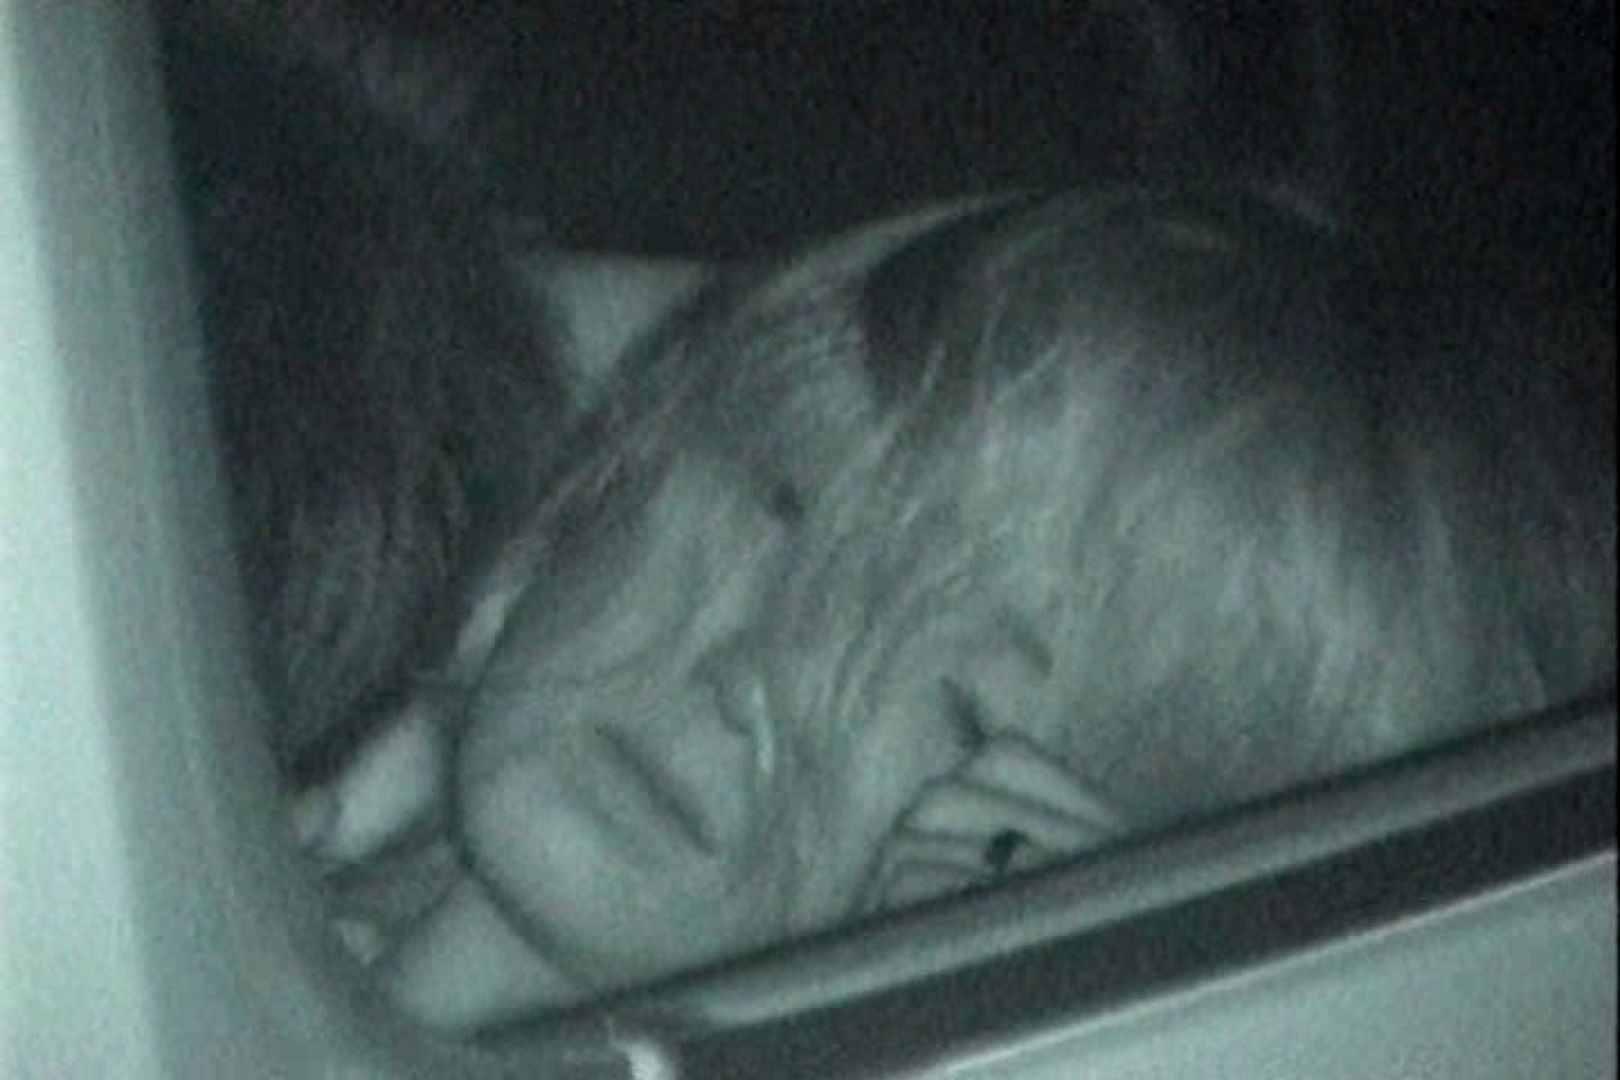 充血監督の深夜の運動会Vol.144 車 戯れ無修正画像 100画像 35